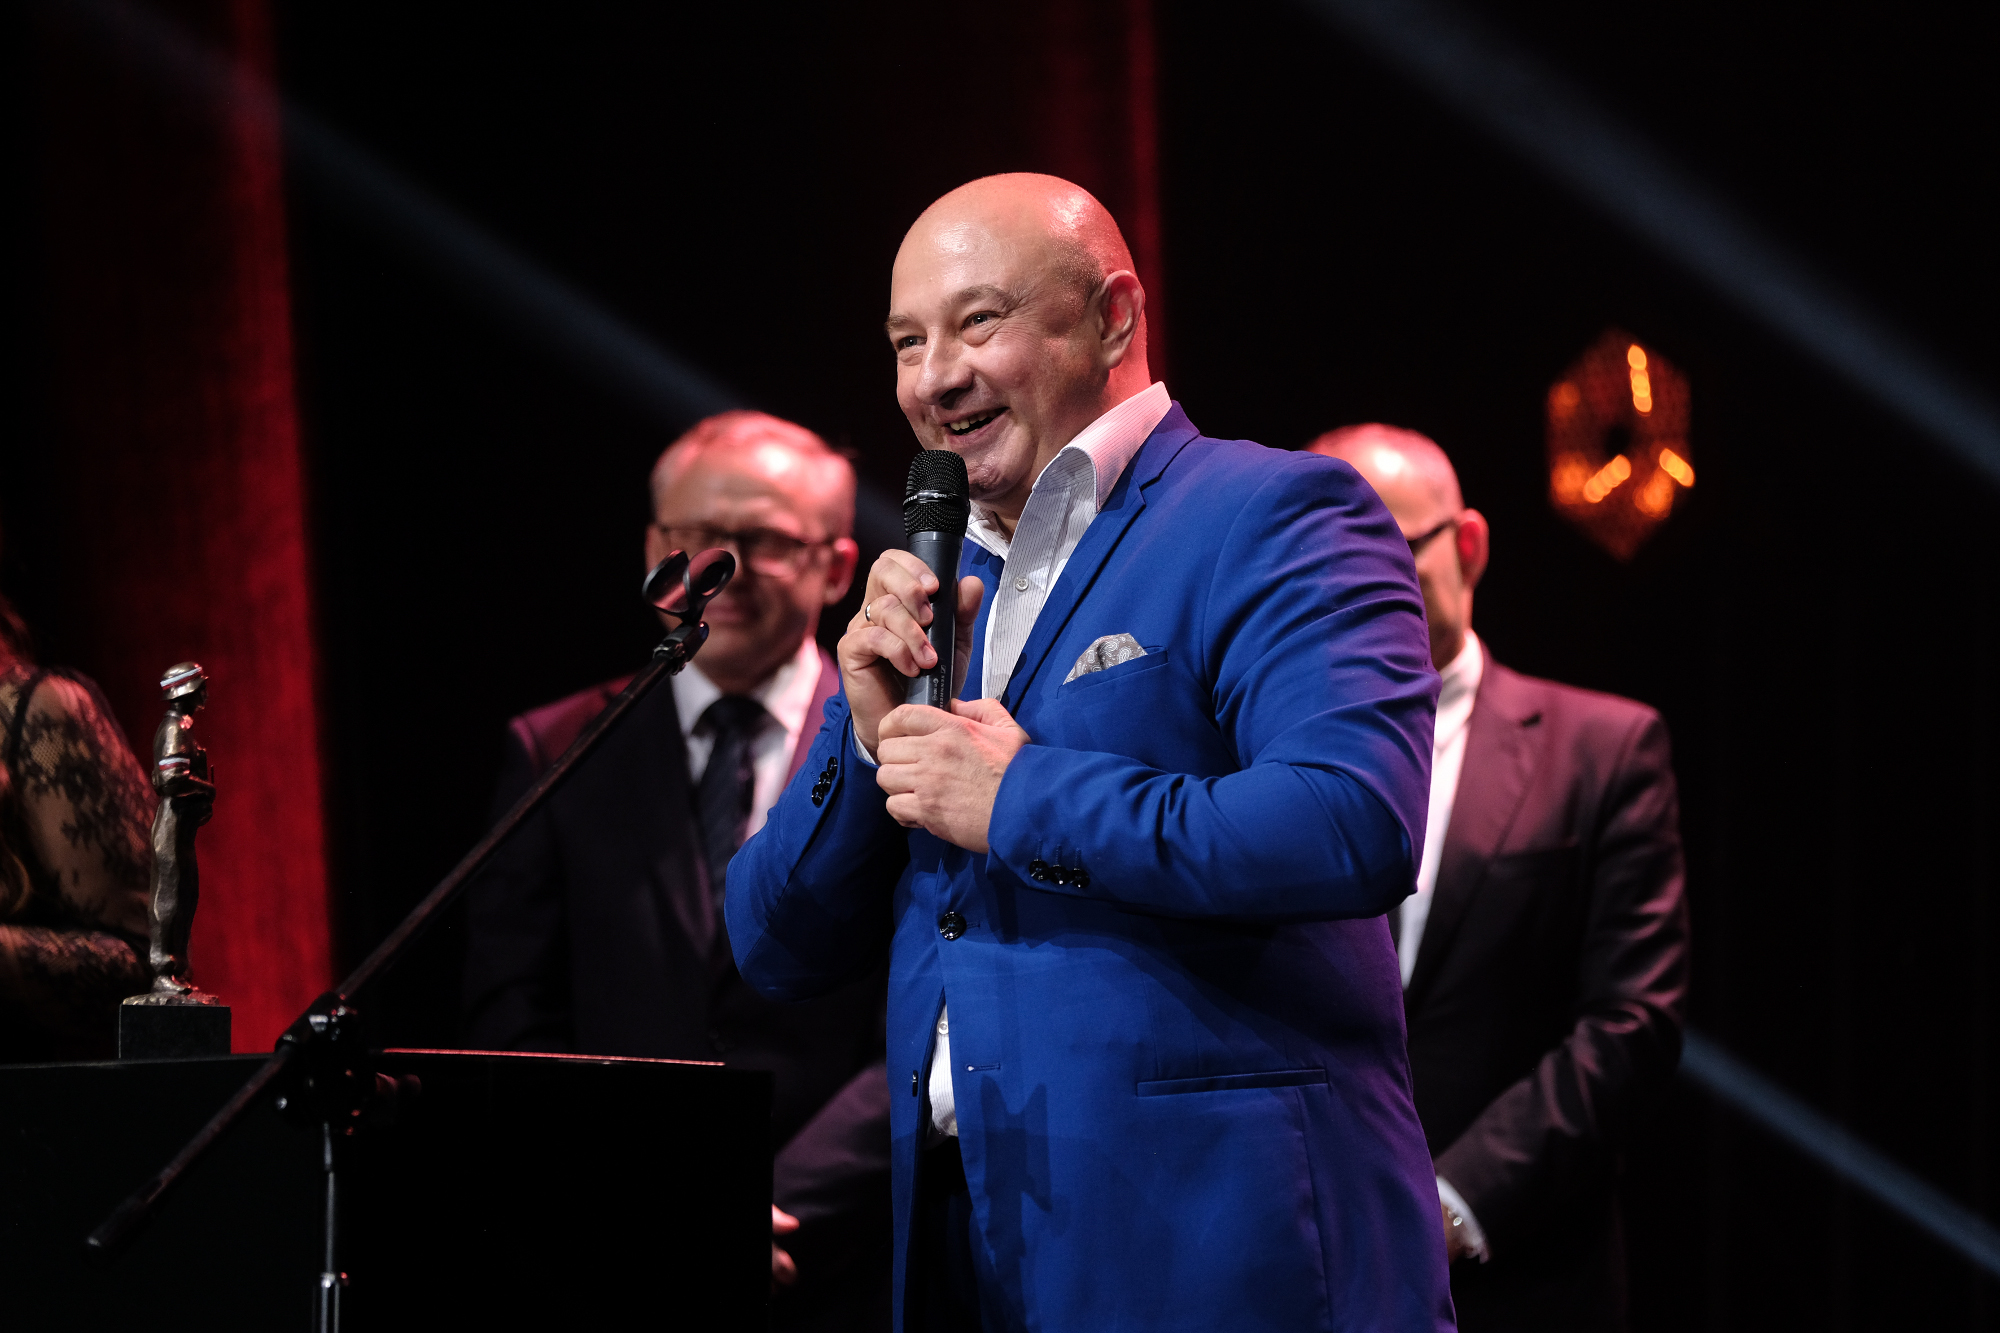 Gala_BohaterONy_2019_fot_Piotr_Litwic (87)